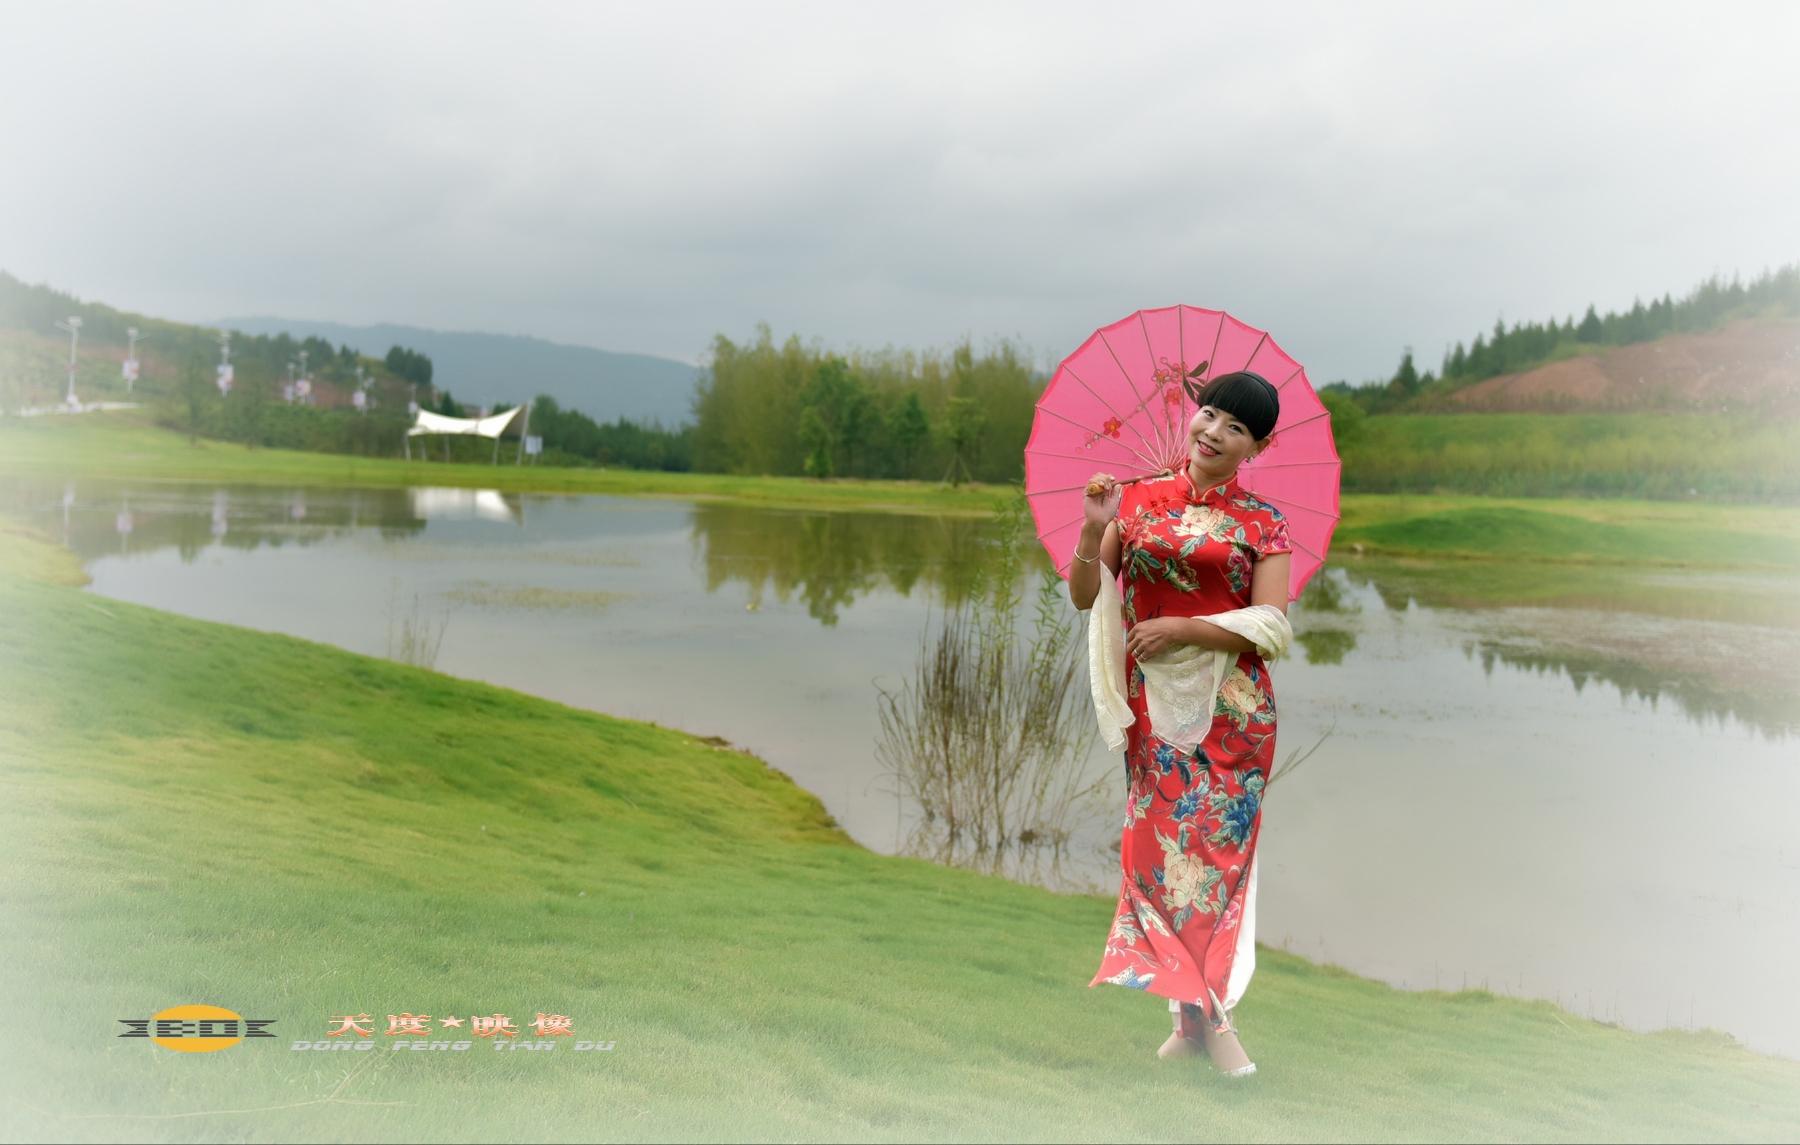 DSC_6486_副本_conew1.jpg